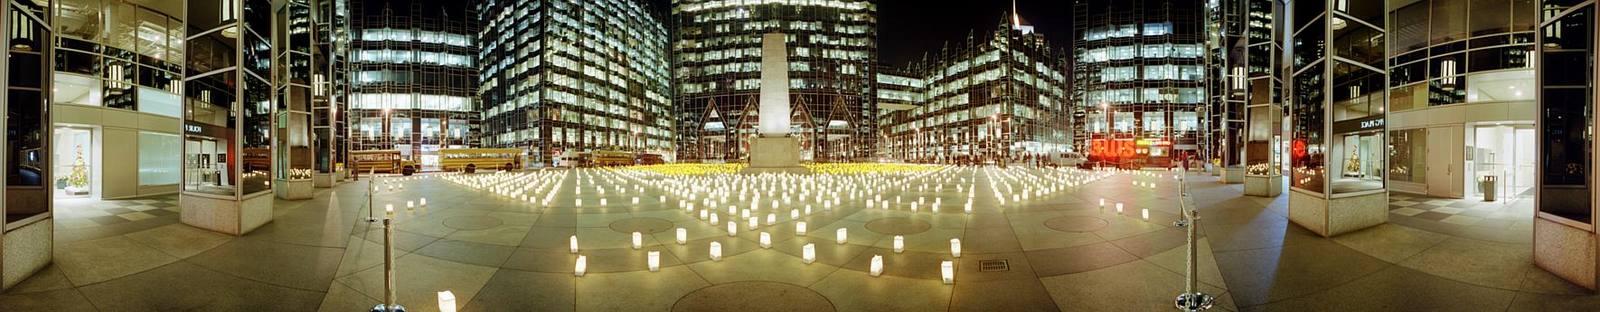 Light Up Night 1999 -- PPG Plaza © 1999 John Strait